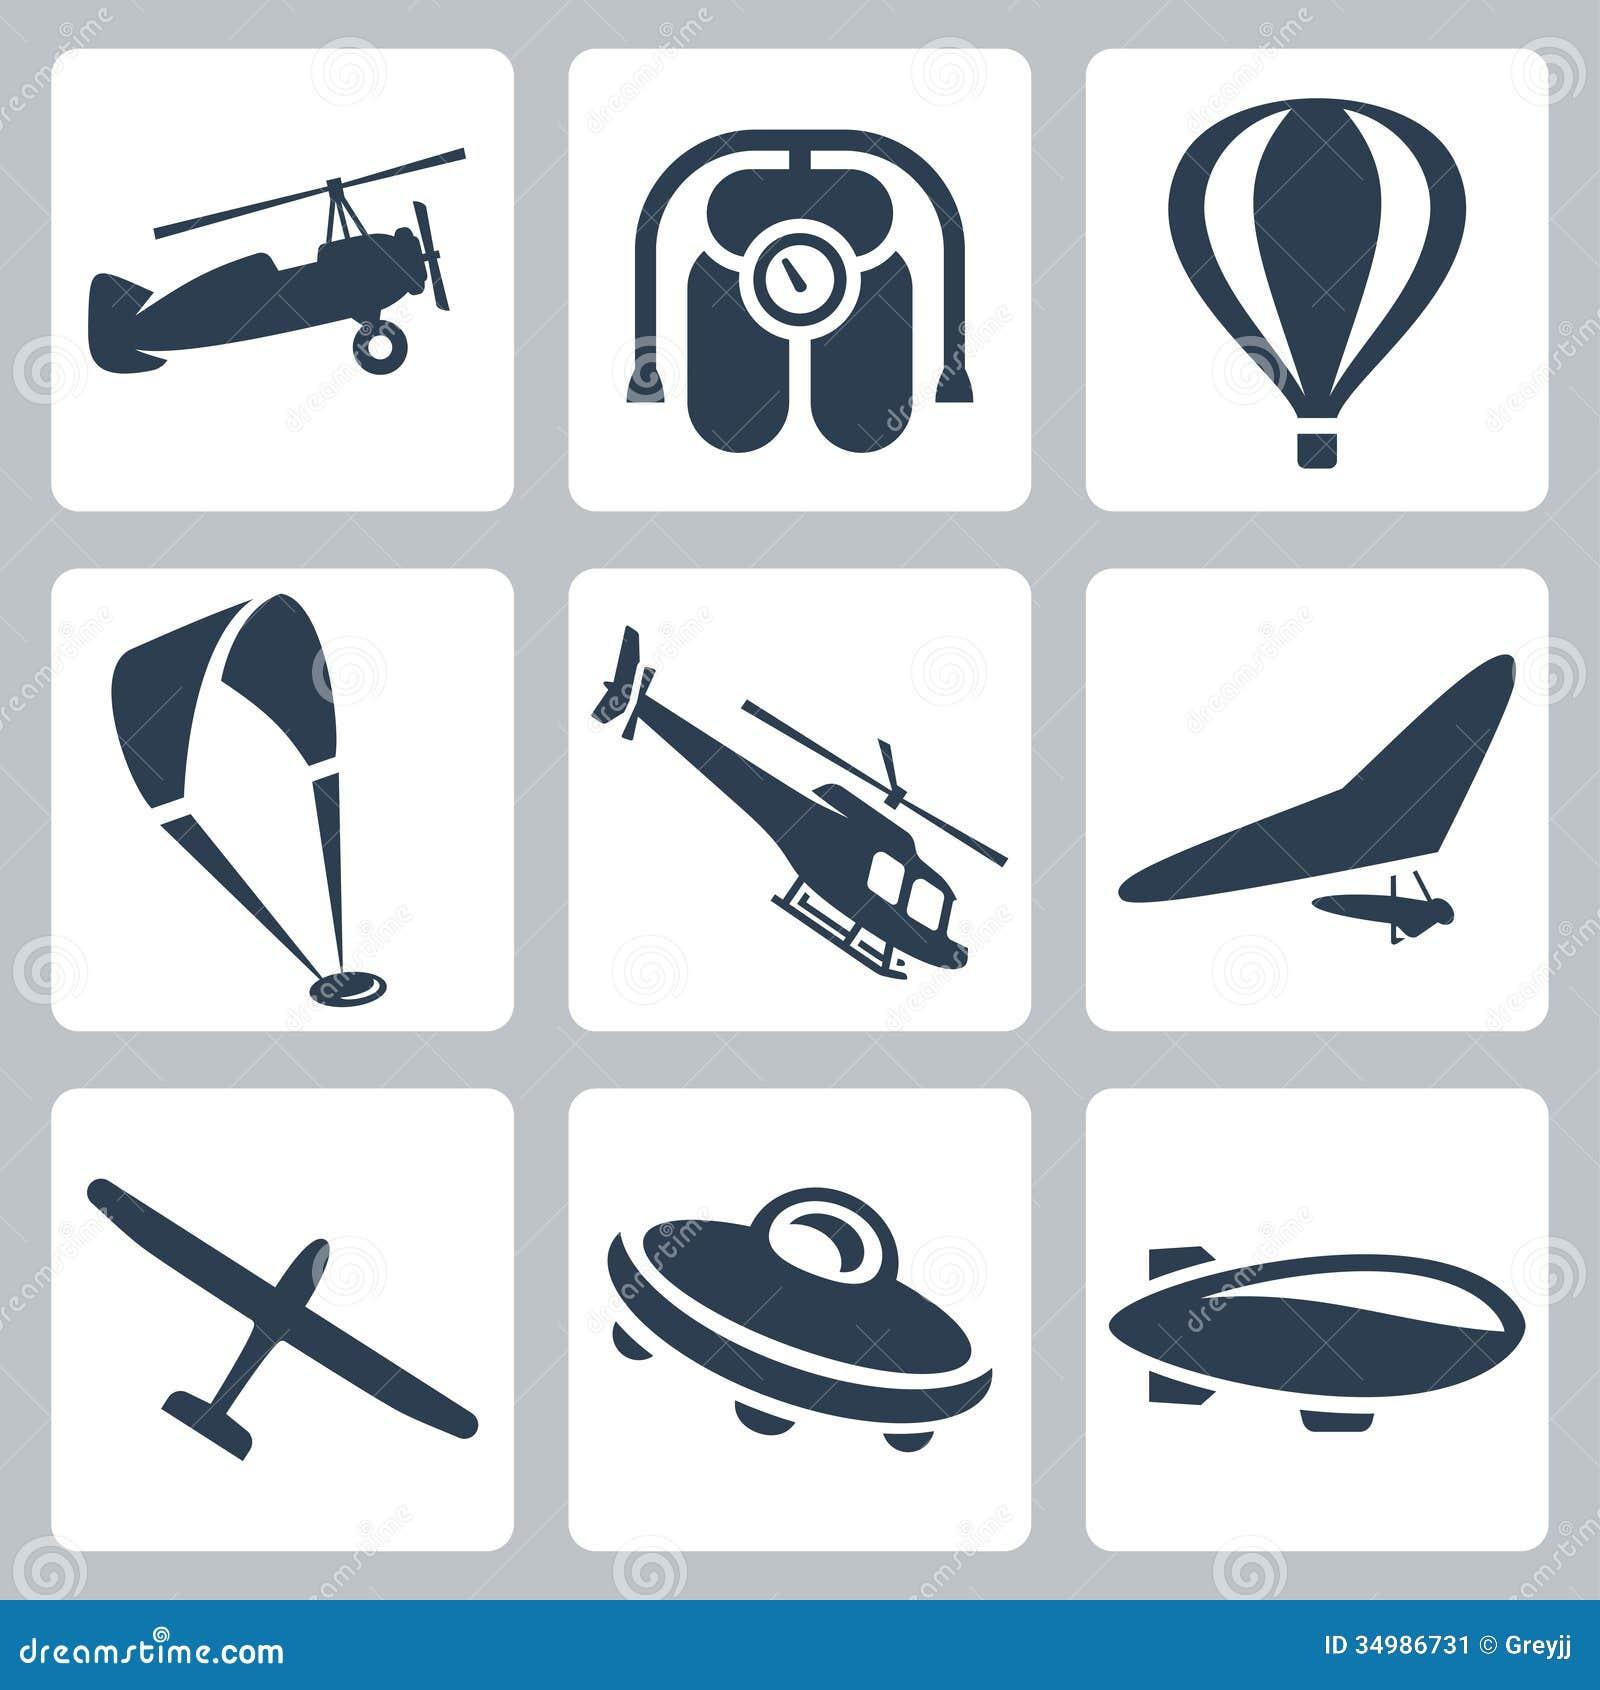 Ufo cartoon stock photos